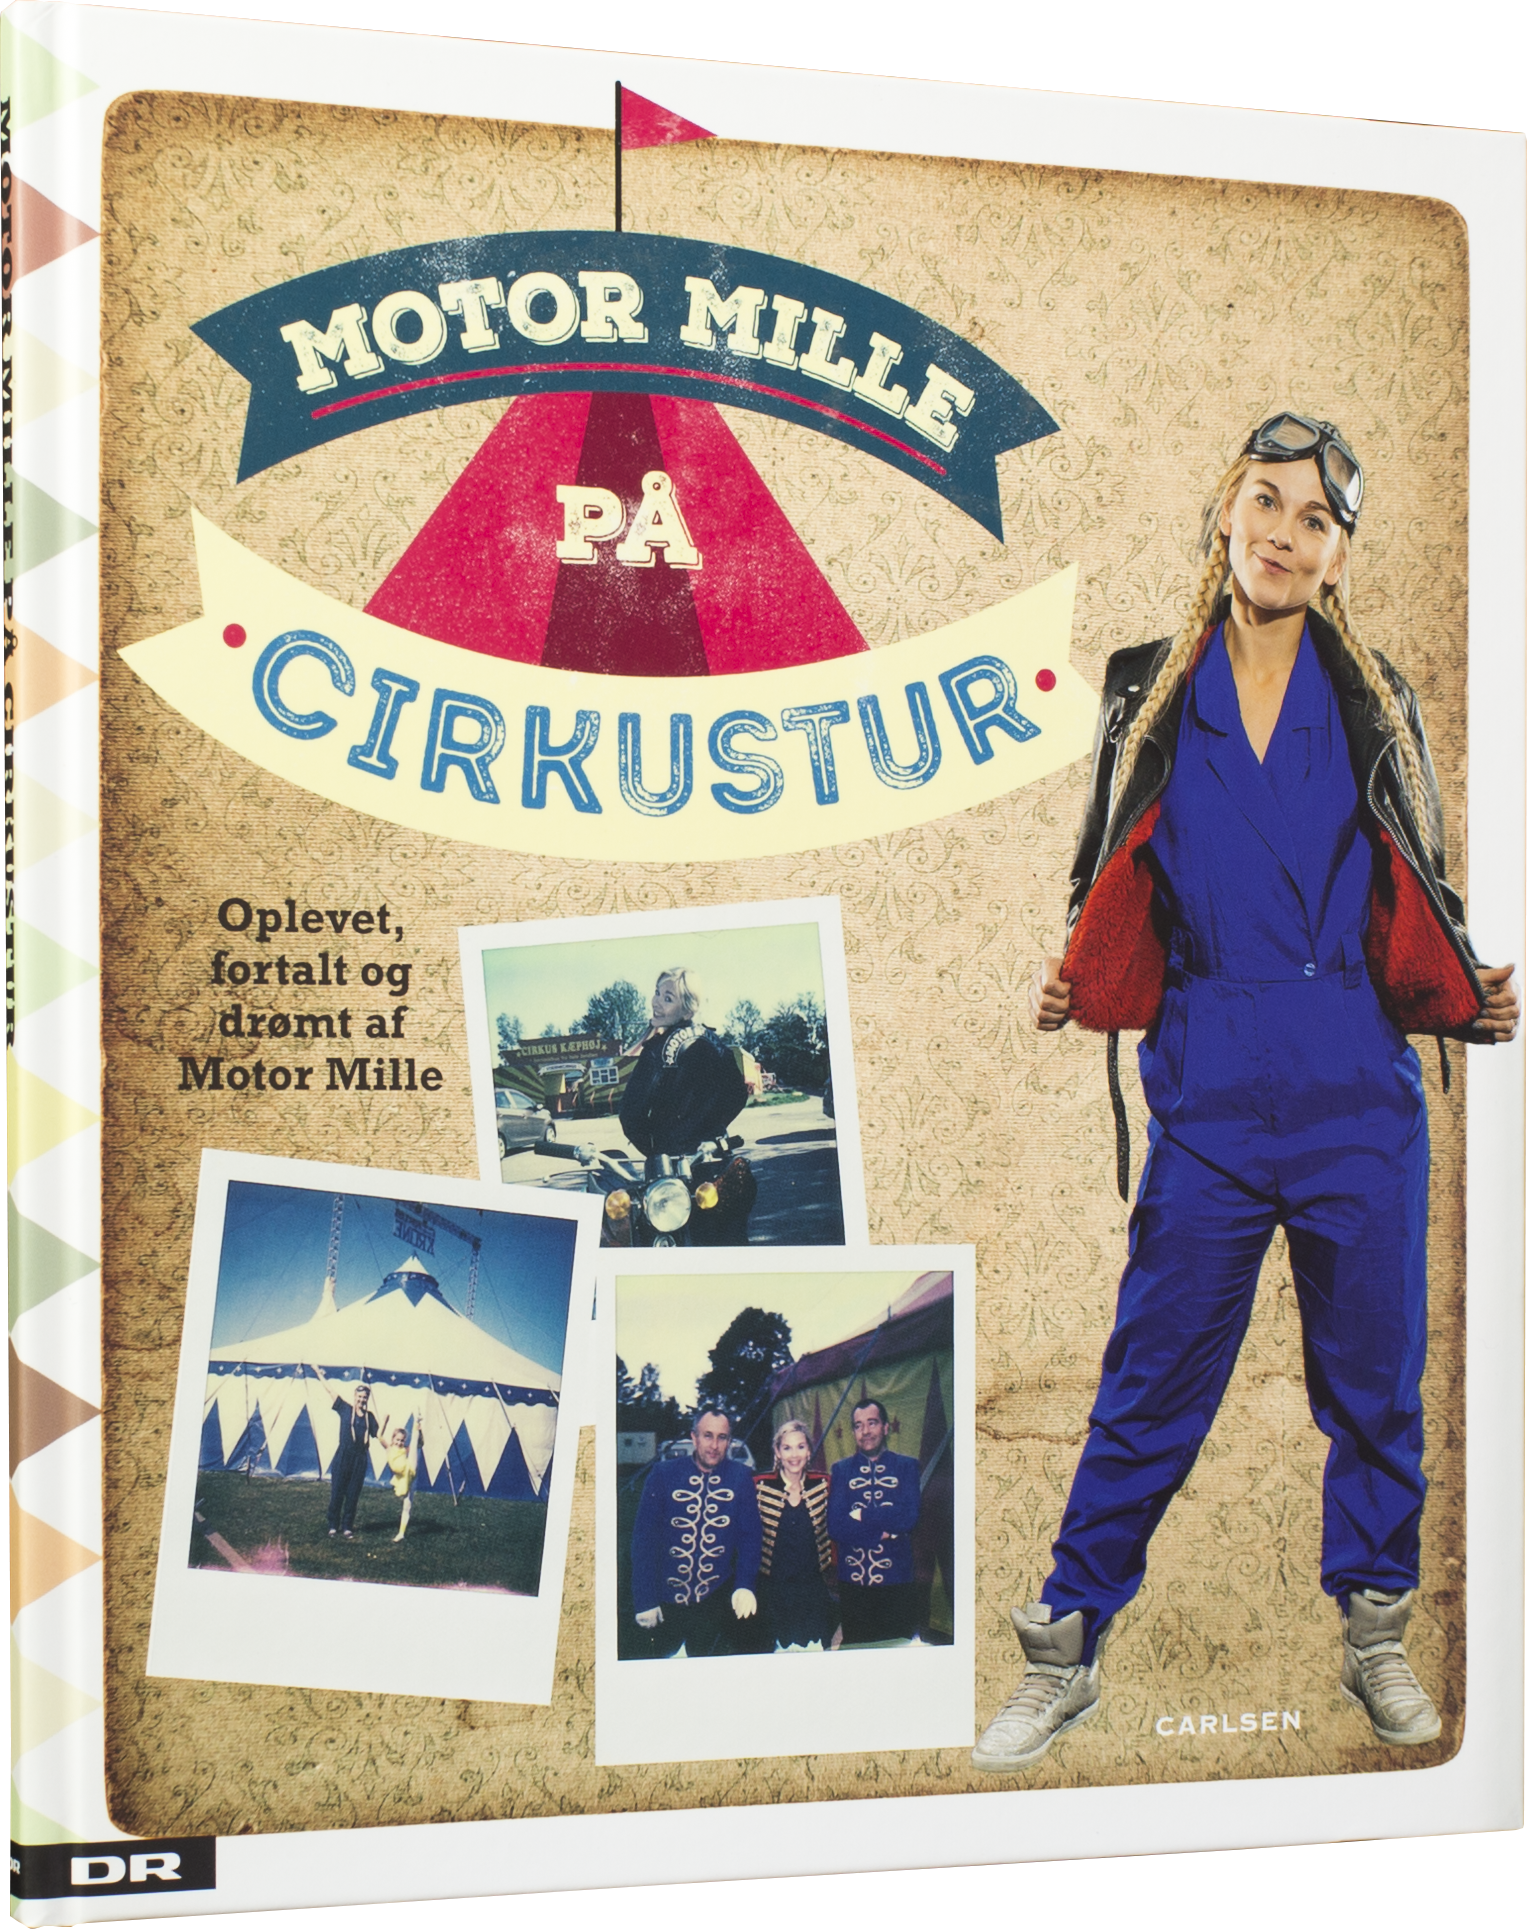 Motor Mille på cirkustur , motor mille, juelgaver, børnebøger, Mille Gori, cirkus, DR ramasjang